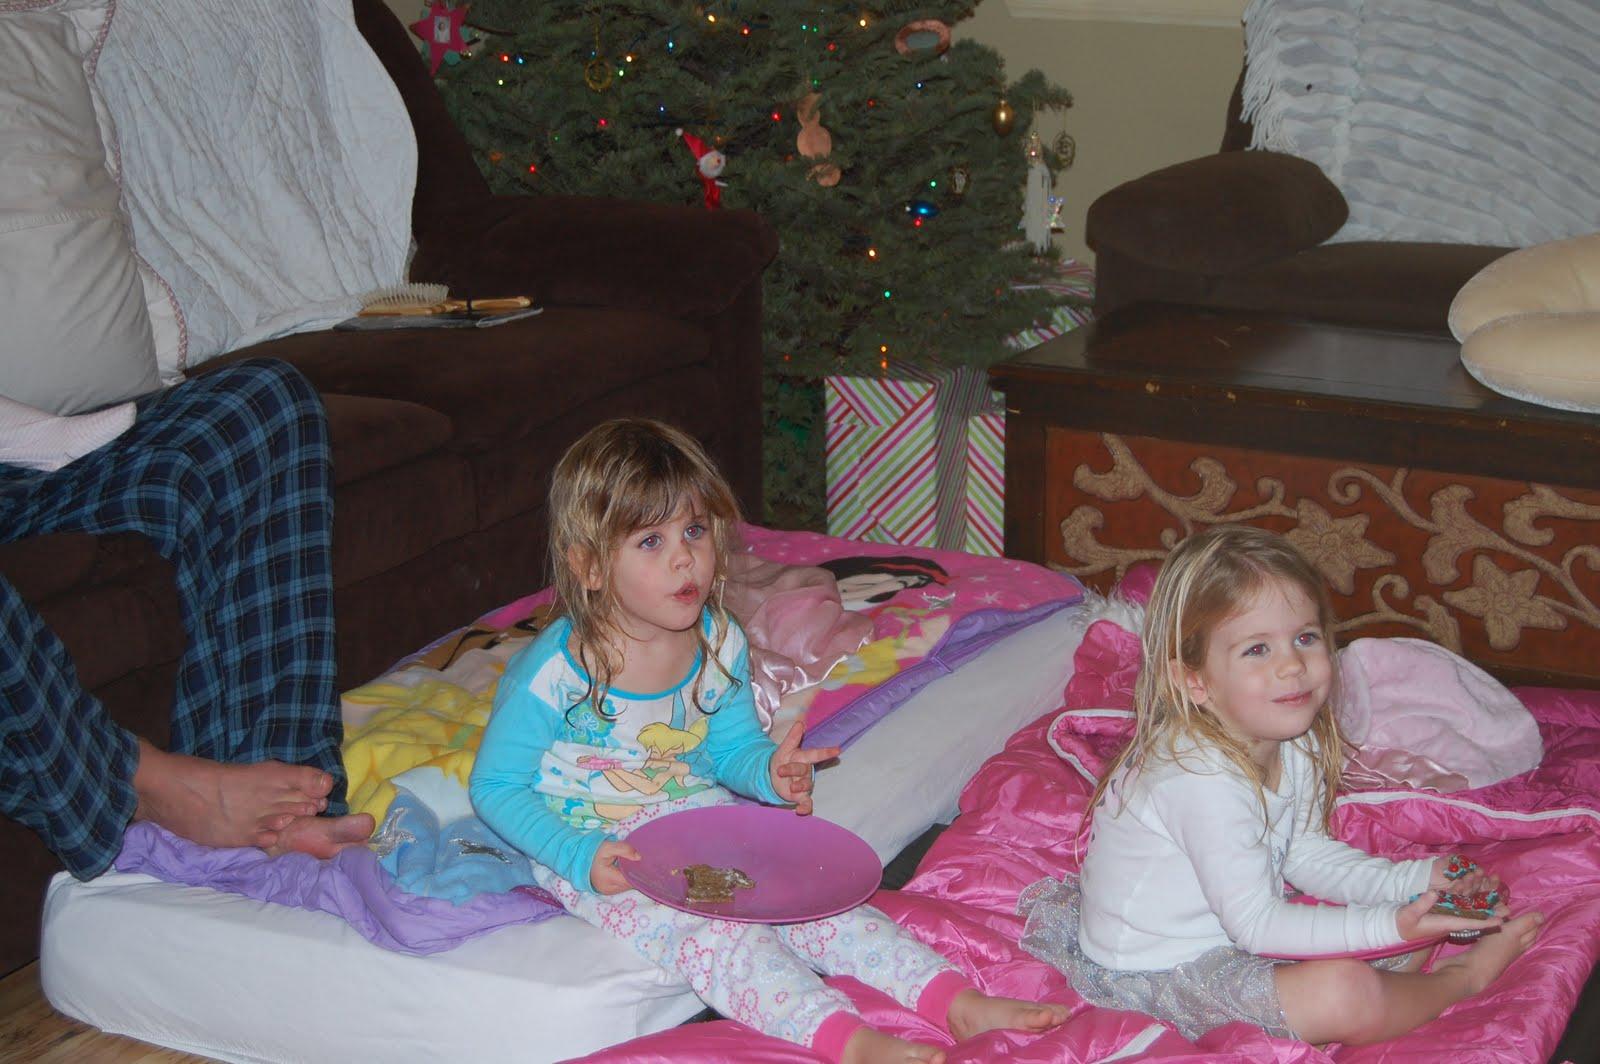 Three Little Women Slumber Party Under The Christmas Tree